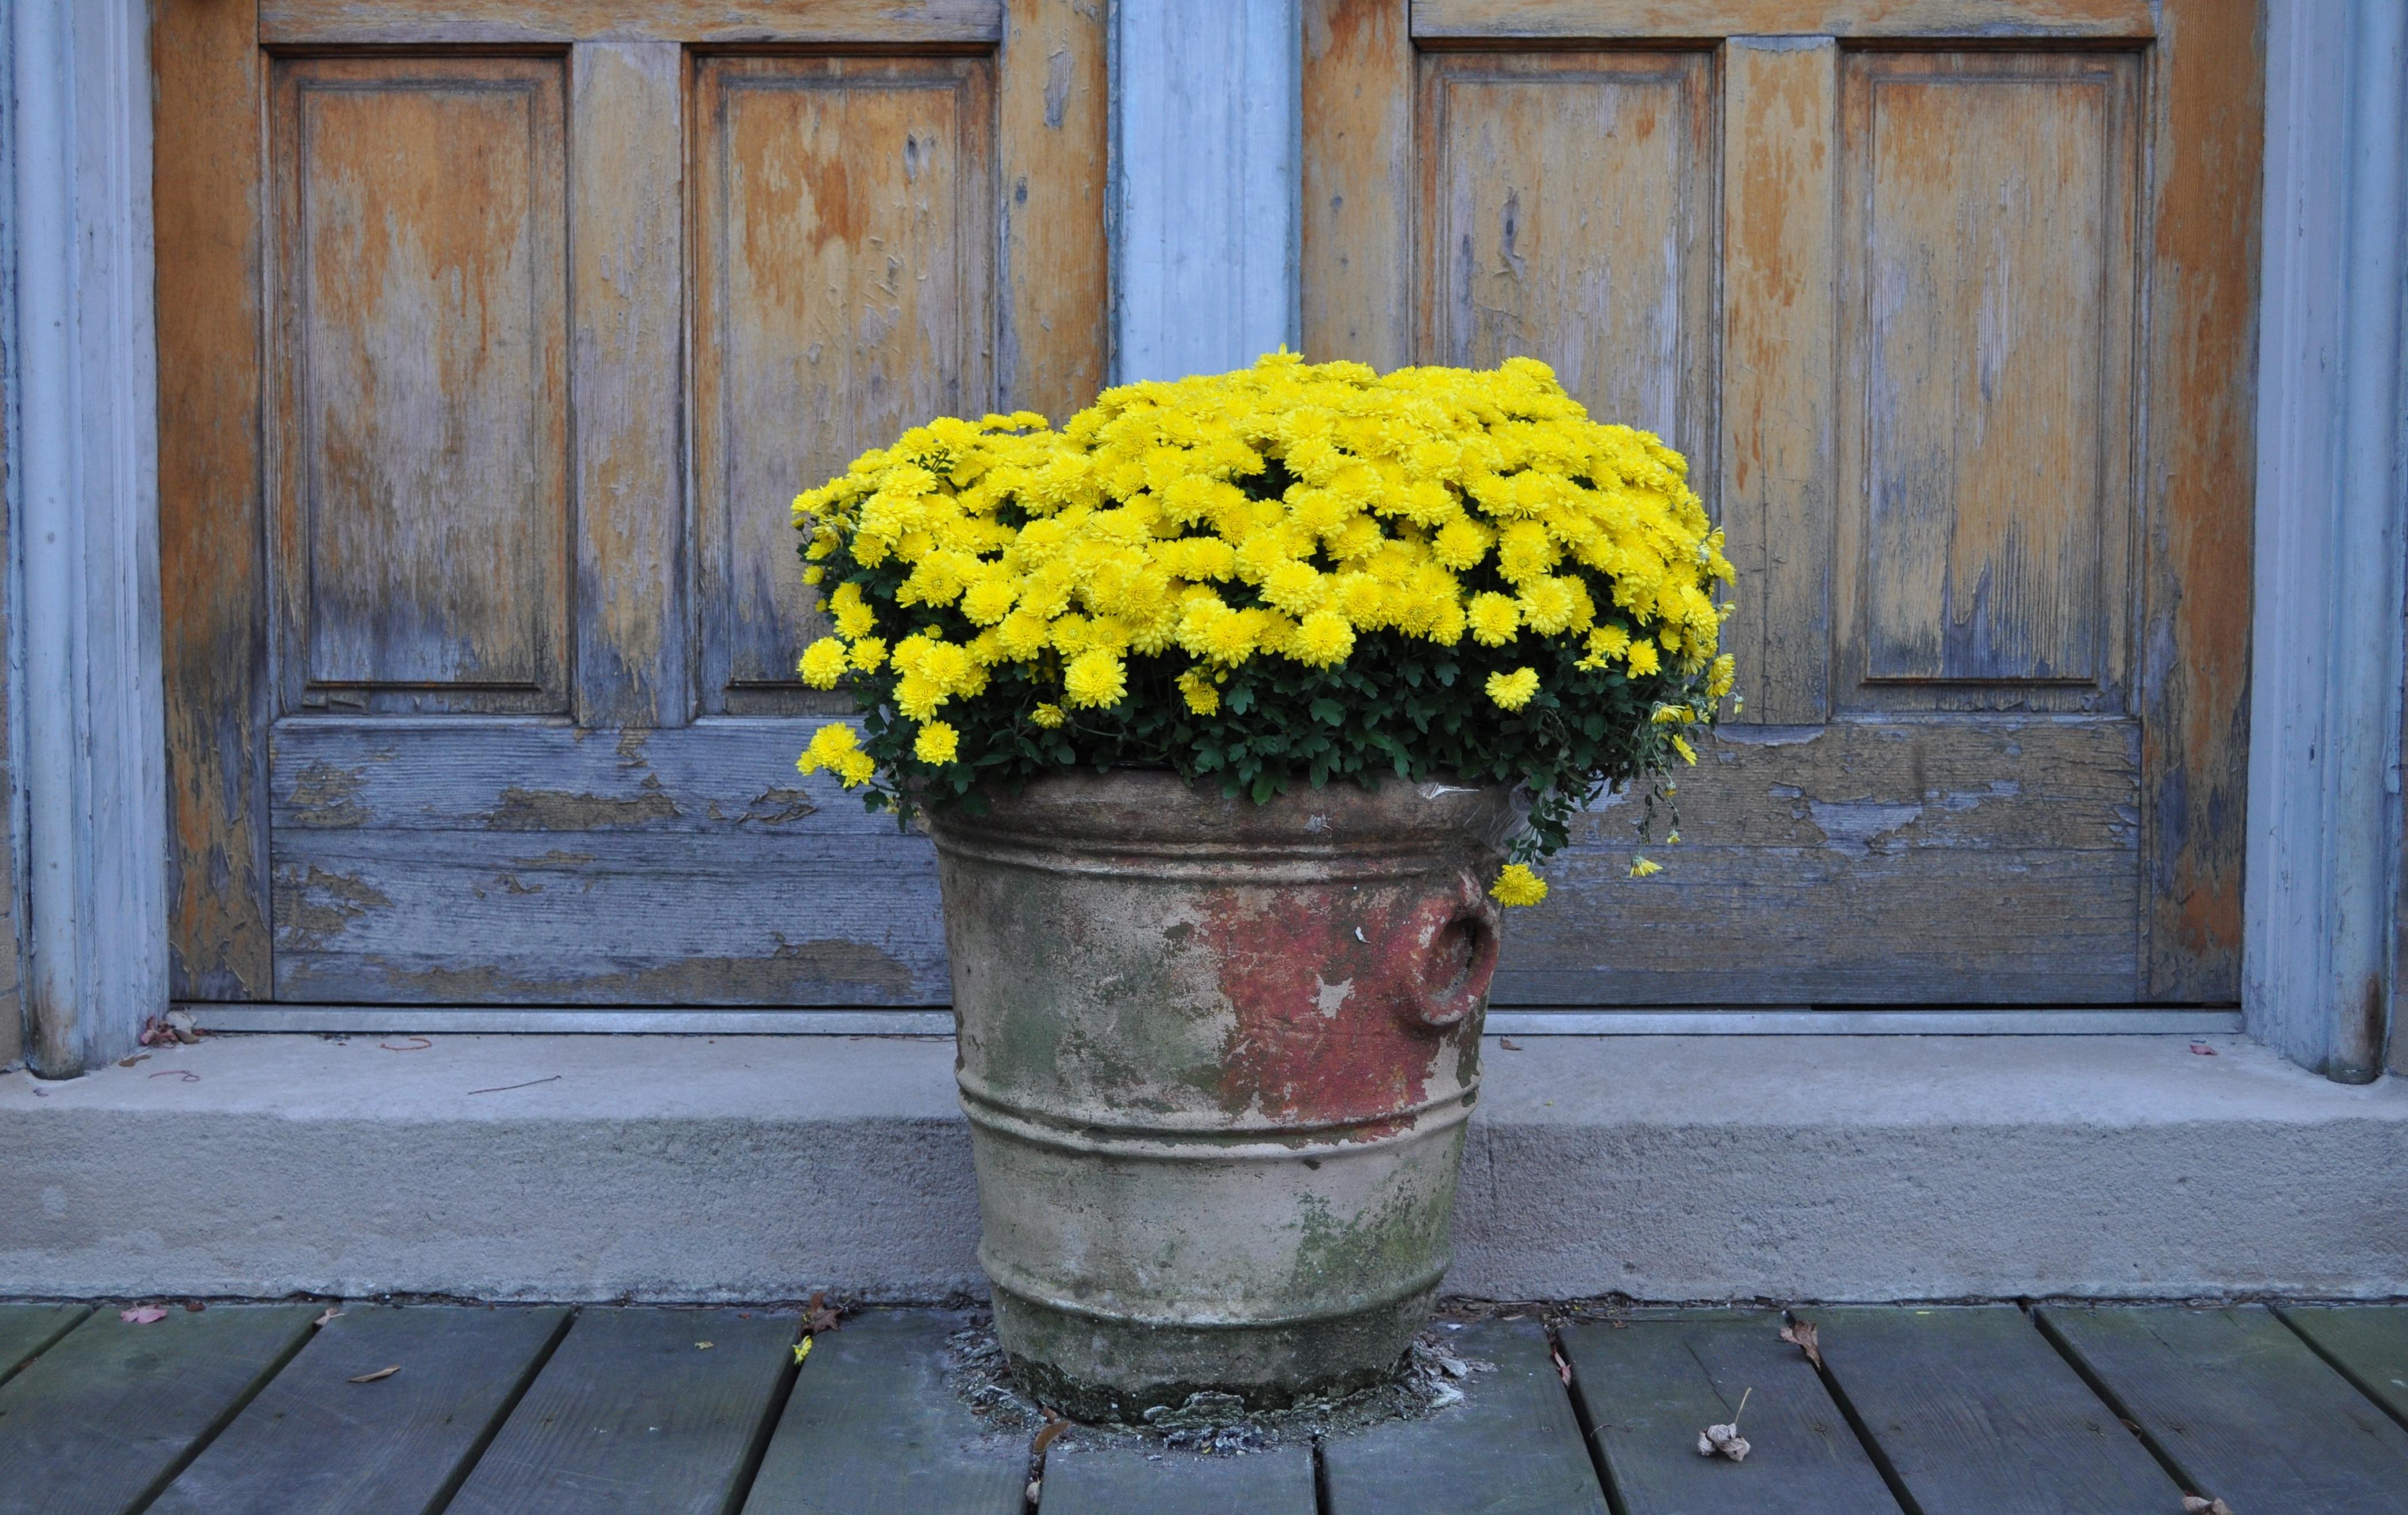 Images Gratuites : tomber, vert, l\'automne, jaune, jardin, pot de ...